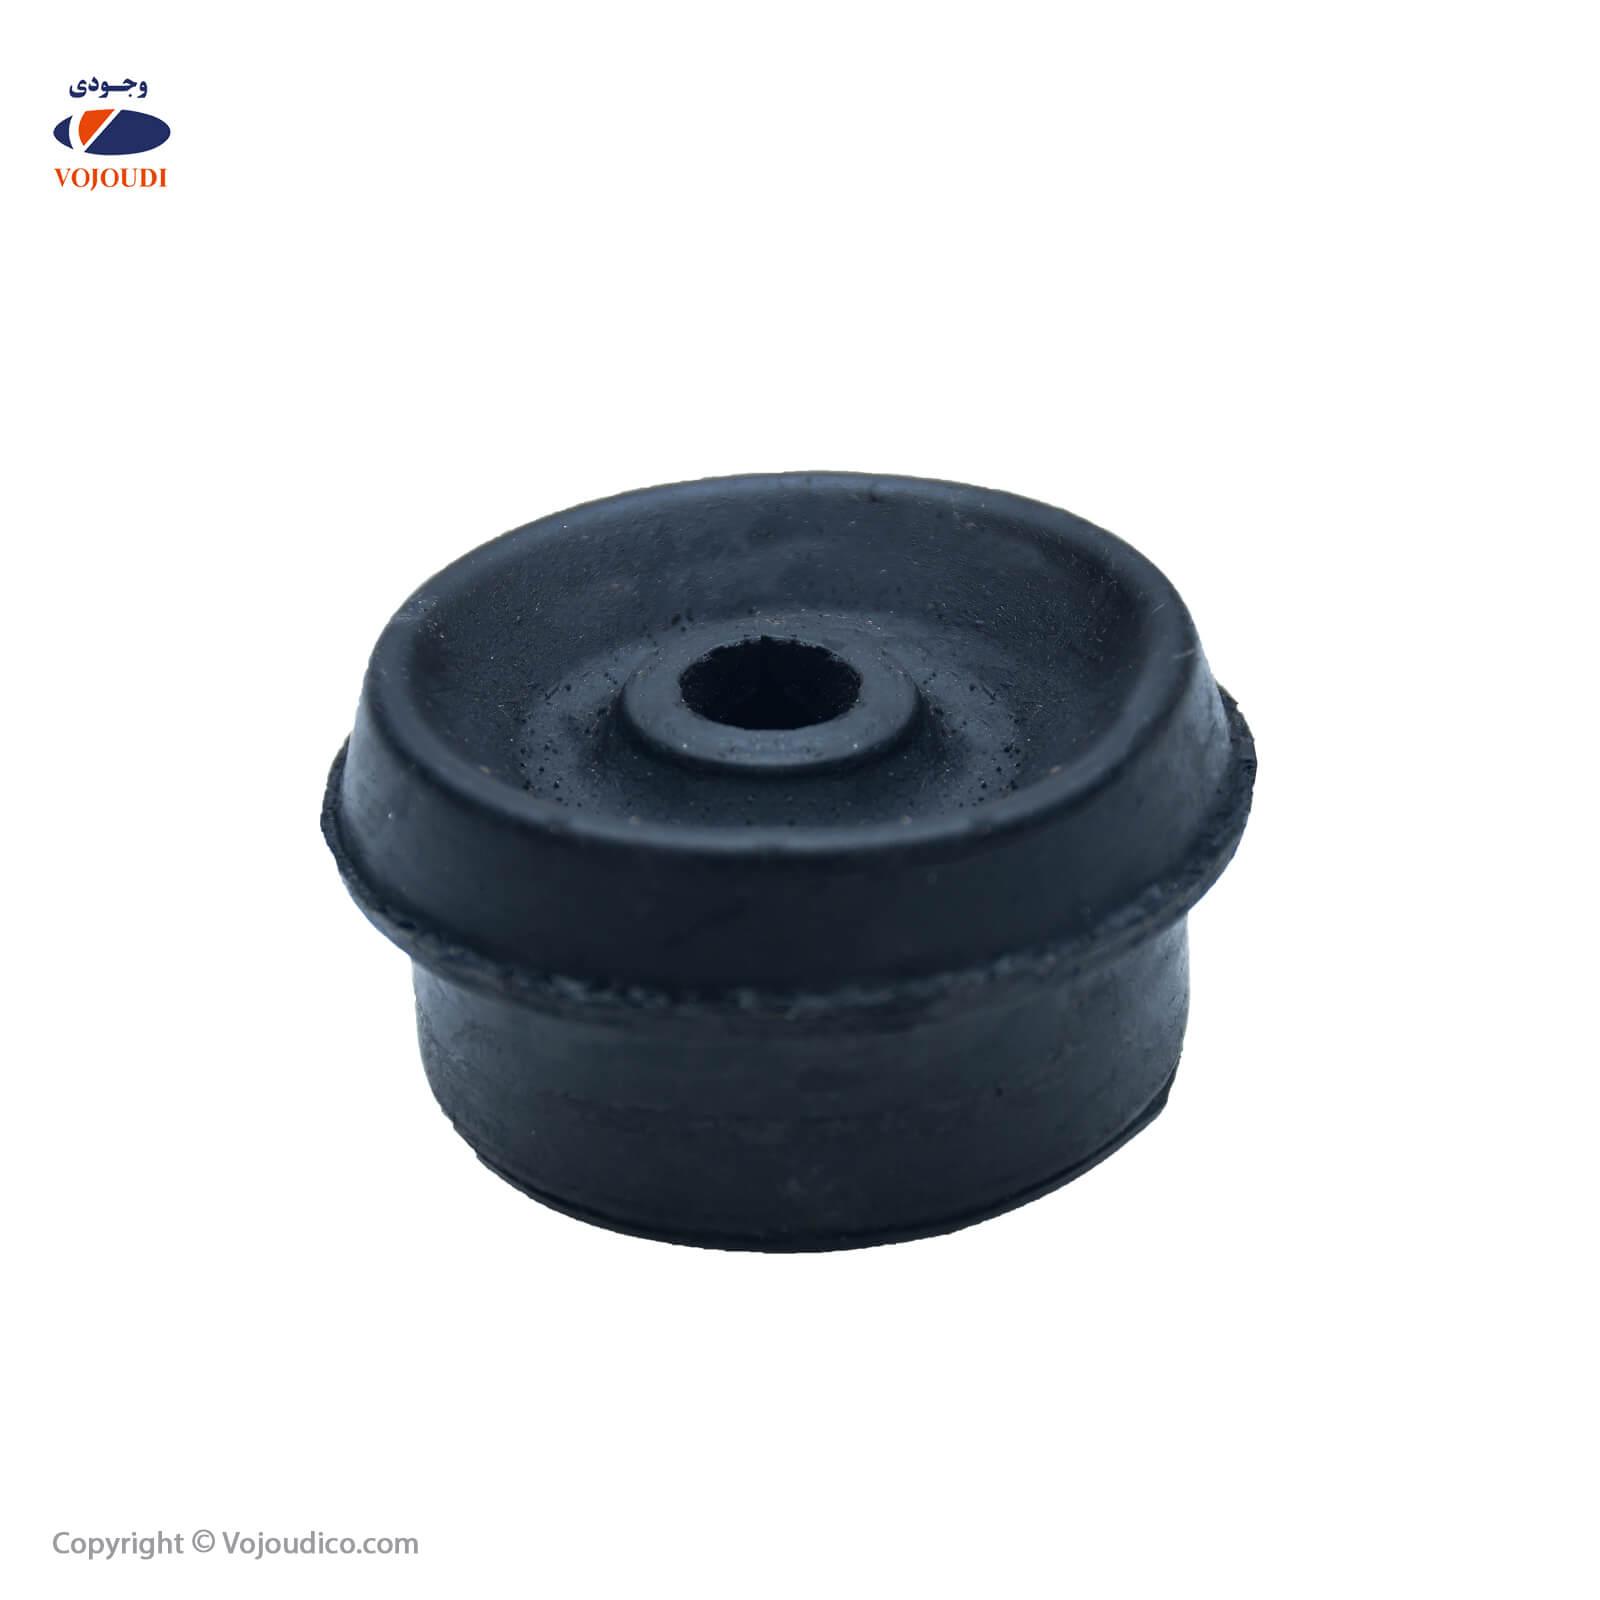 3154 1 - بوش دور پلاستيكی اكسل عقب وجودی کد 3154 مناسب برای 405-GL-GLX ، تعداد بسته : 25 عدد